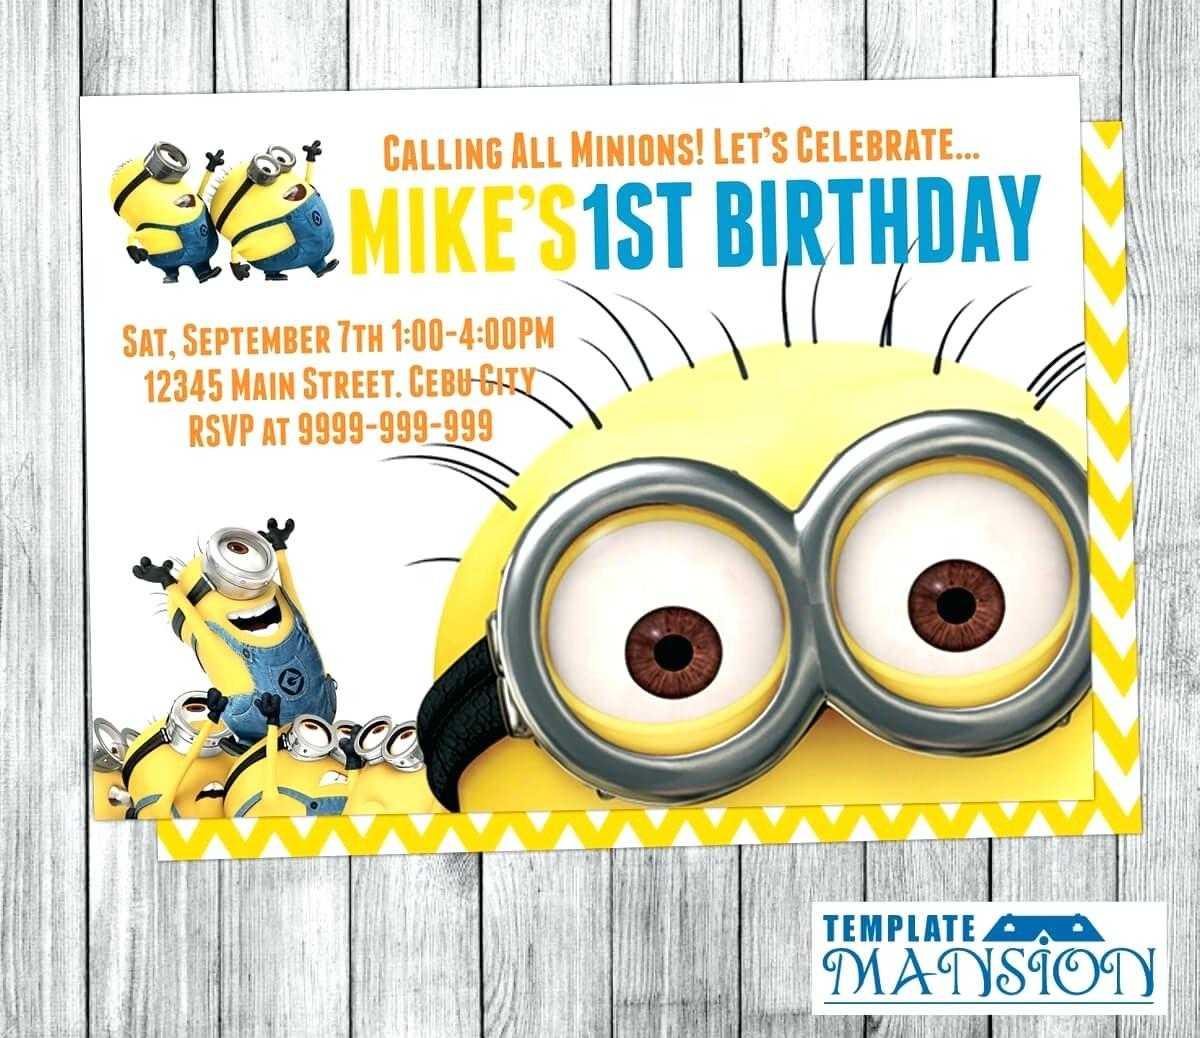 Minion Birthday Invitations Print Card Free Template 3D Pertaining To Minion Card Template